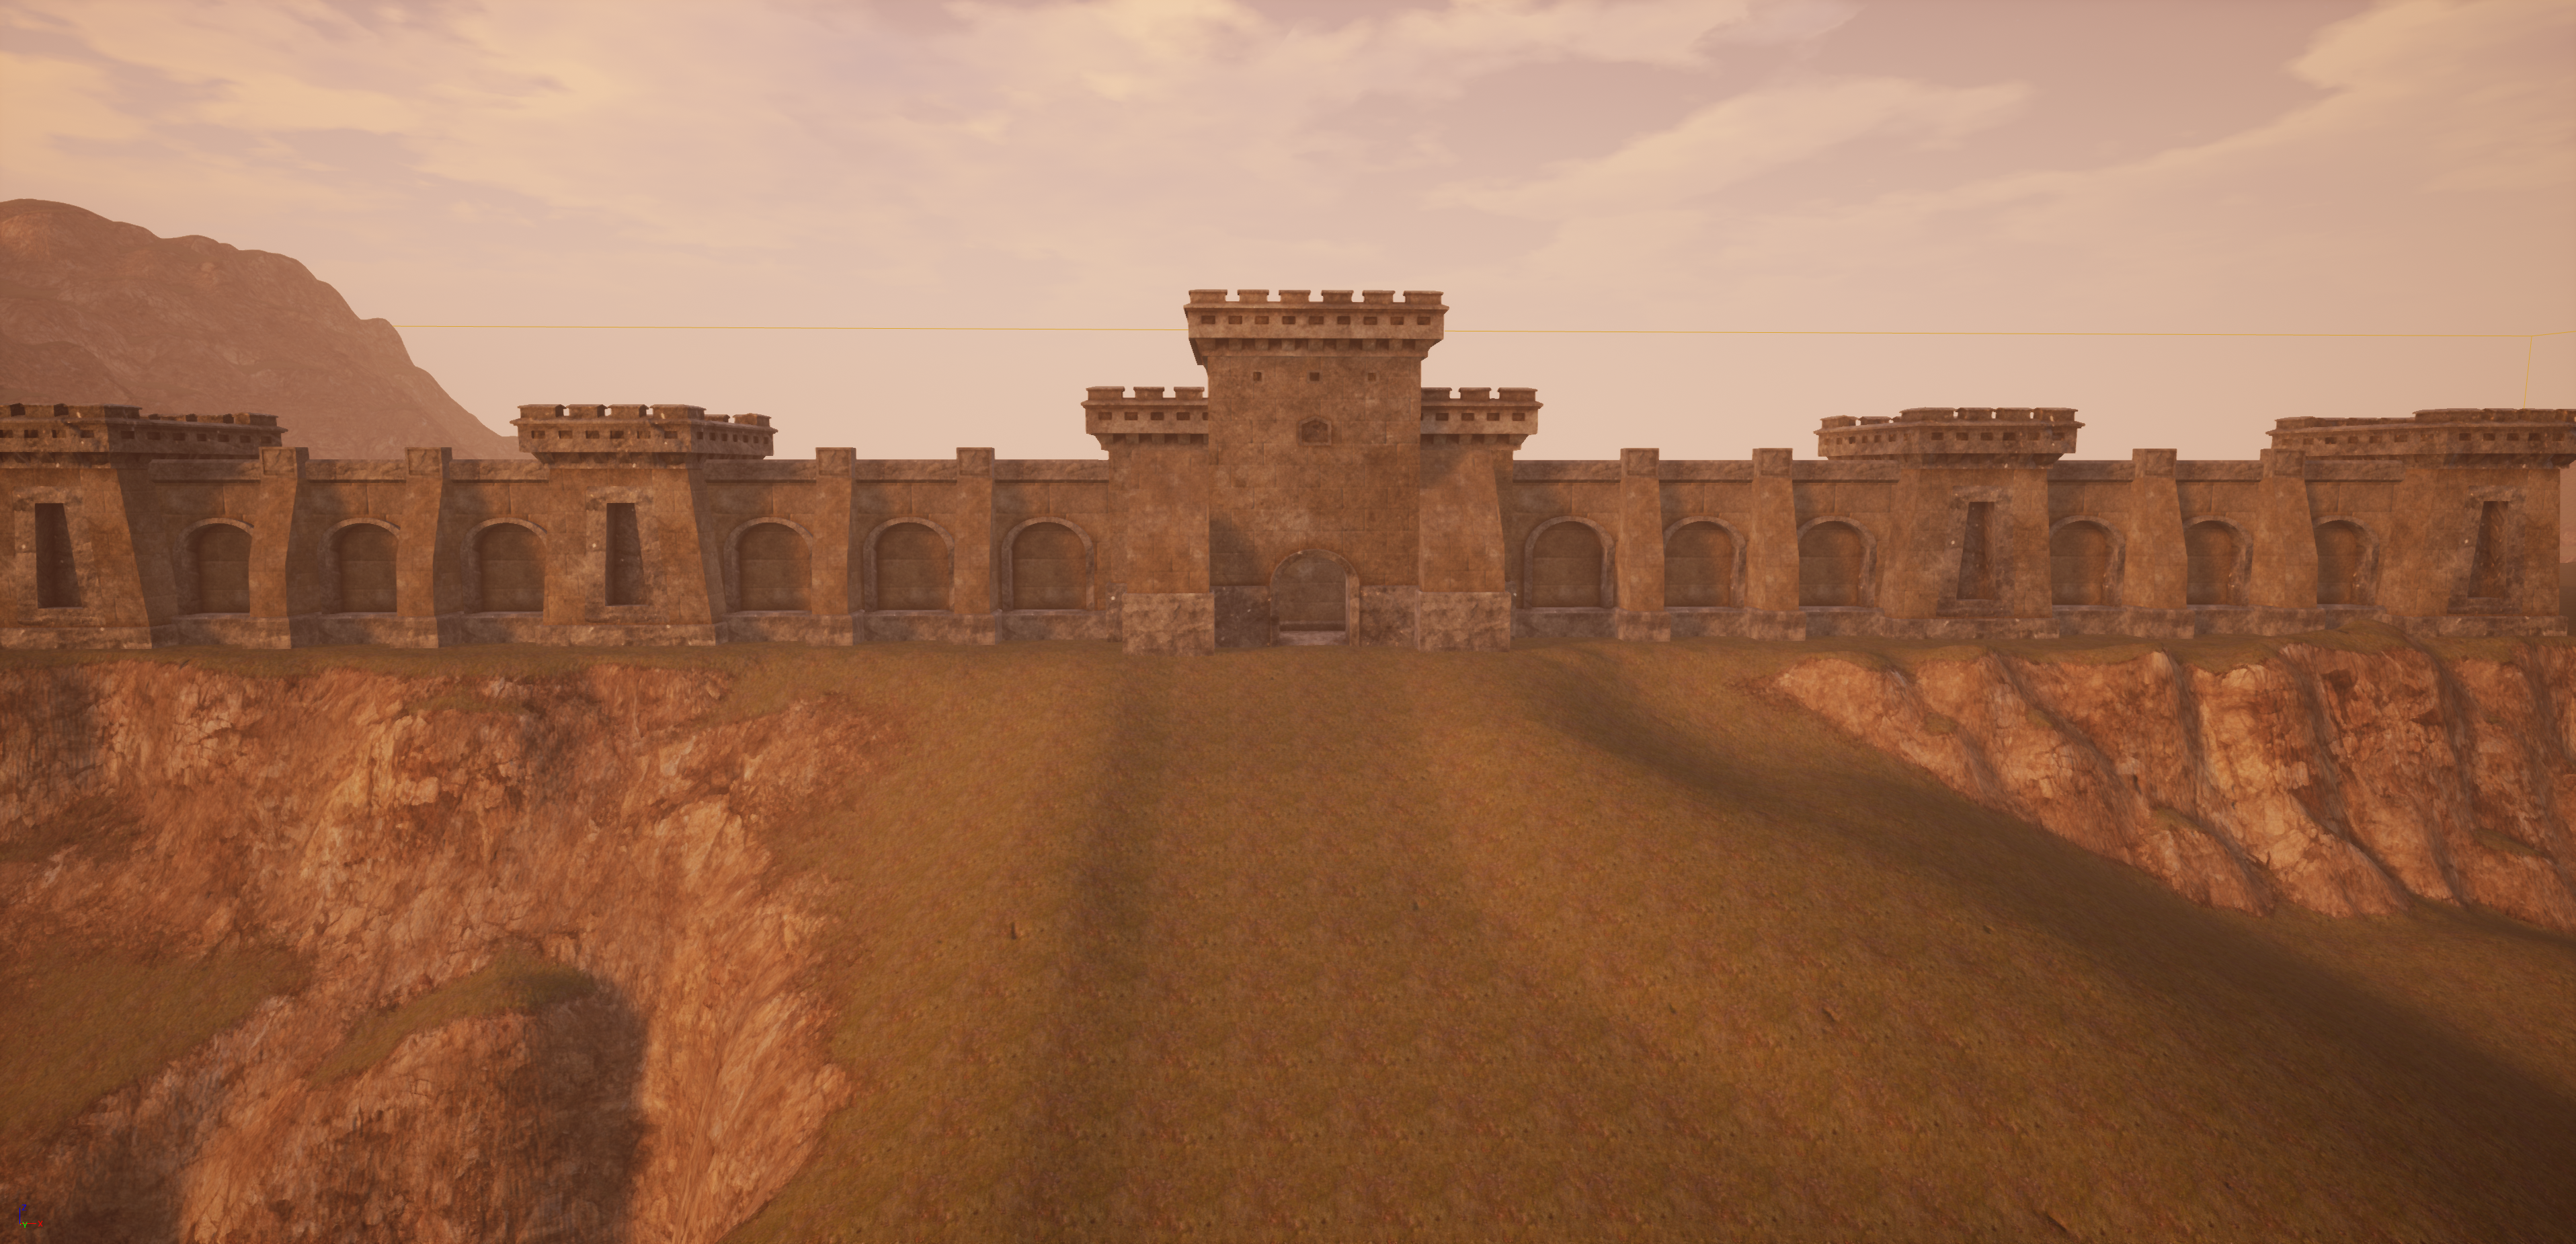 Unreal Engine Lordaeron Walls Bfa Cinematic Style Concept 1 Worldofwarcraft Blizzard Hearthstone Wow War World Of Warcraft Unreal Engine Natural Landmarks